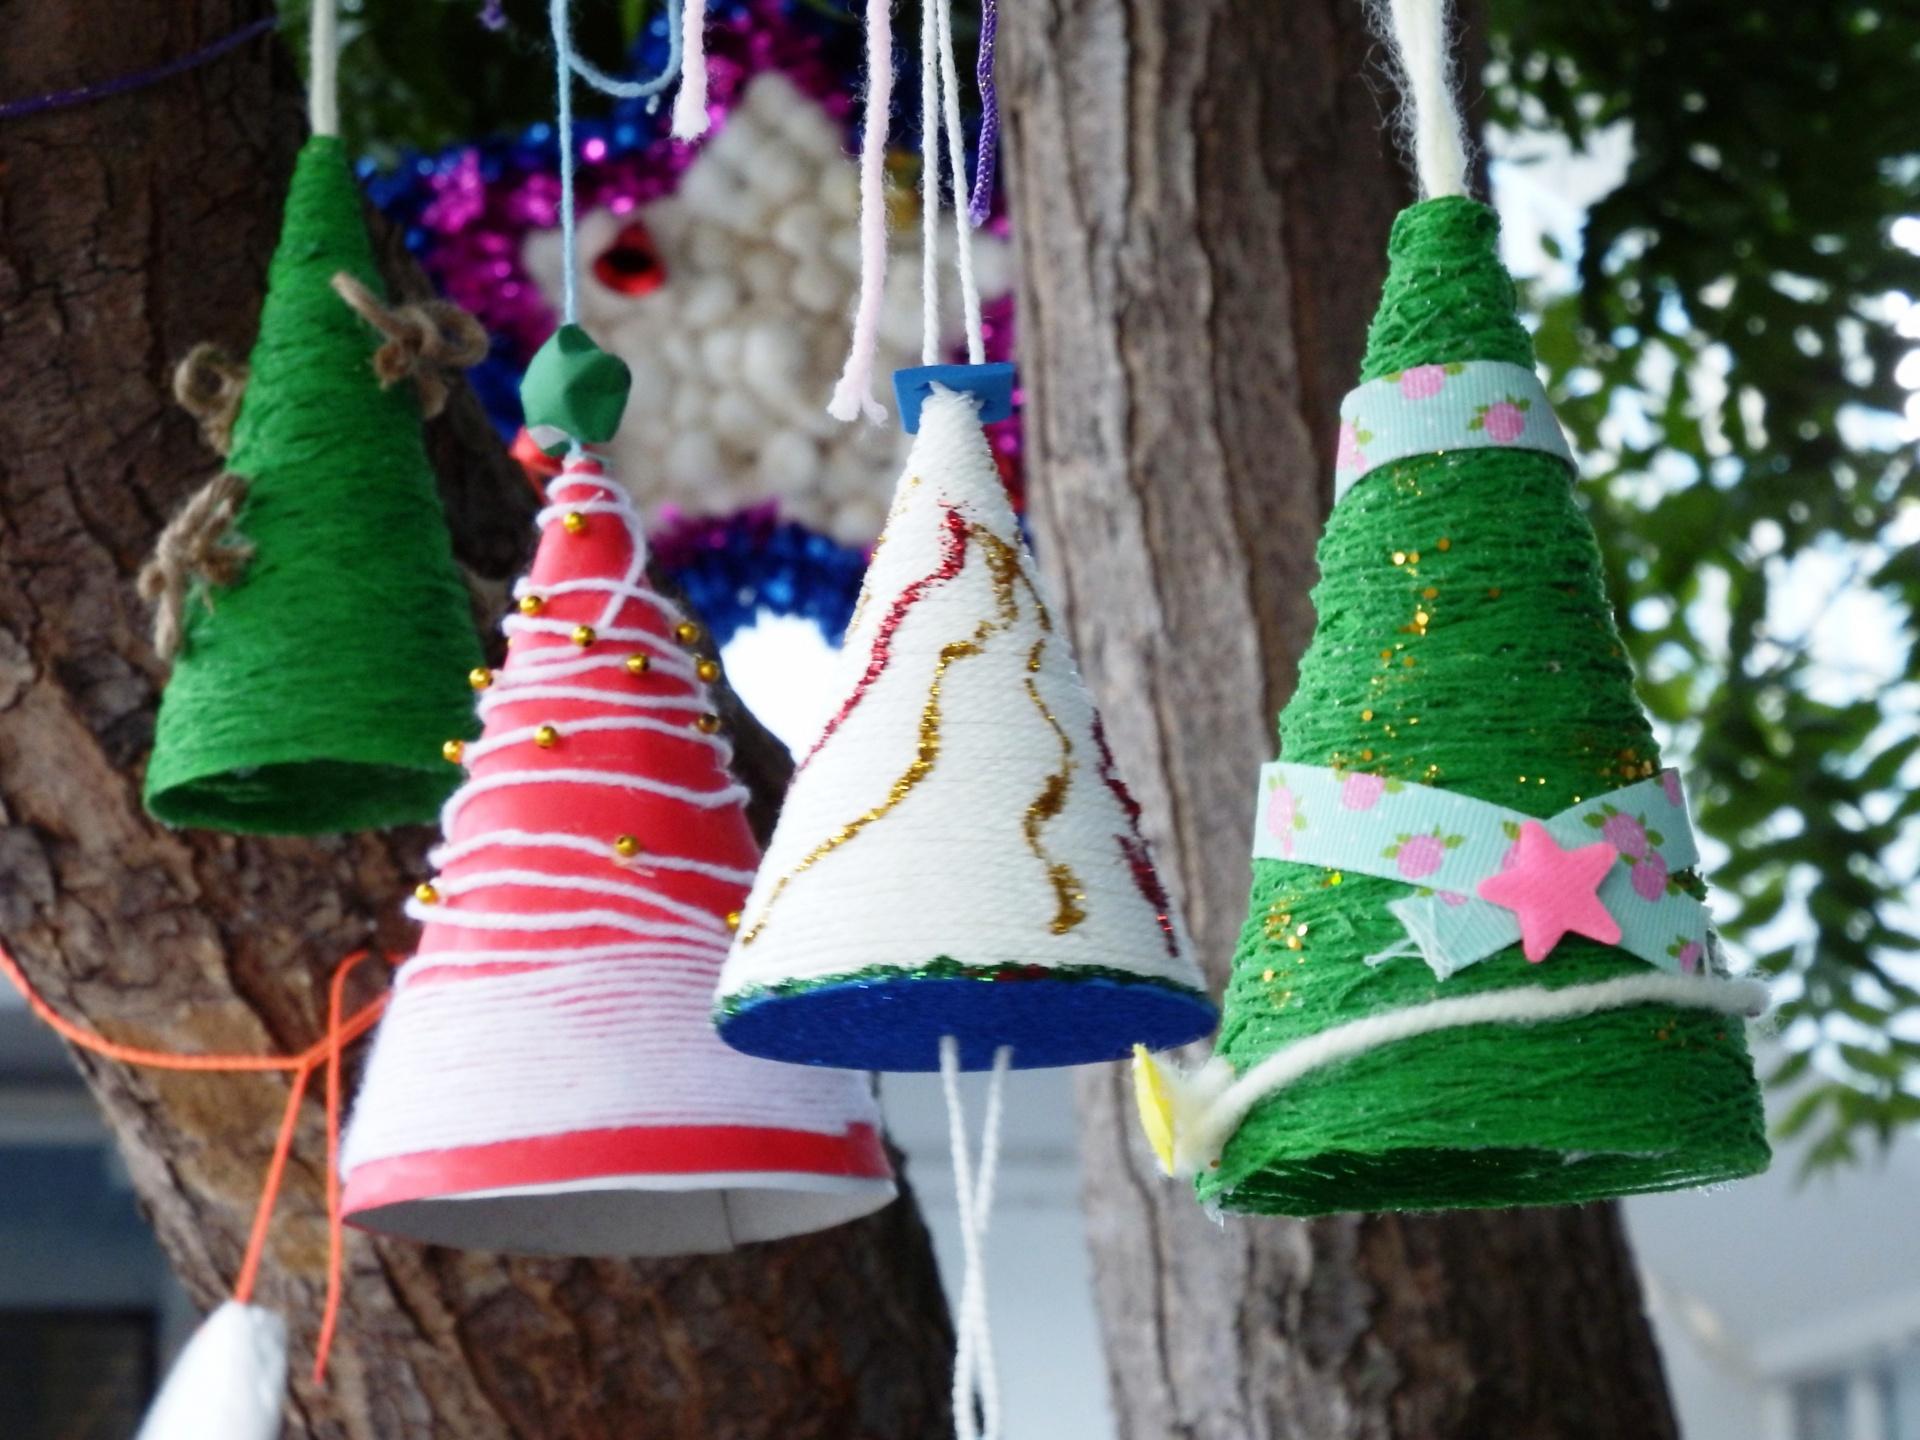 Idee Creative Per Natale alberi di natale fai da te: tante idee creative